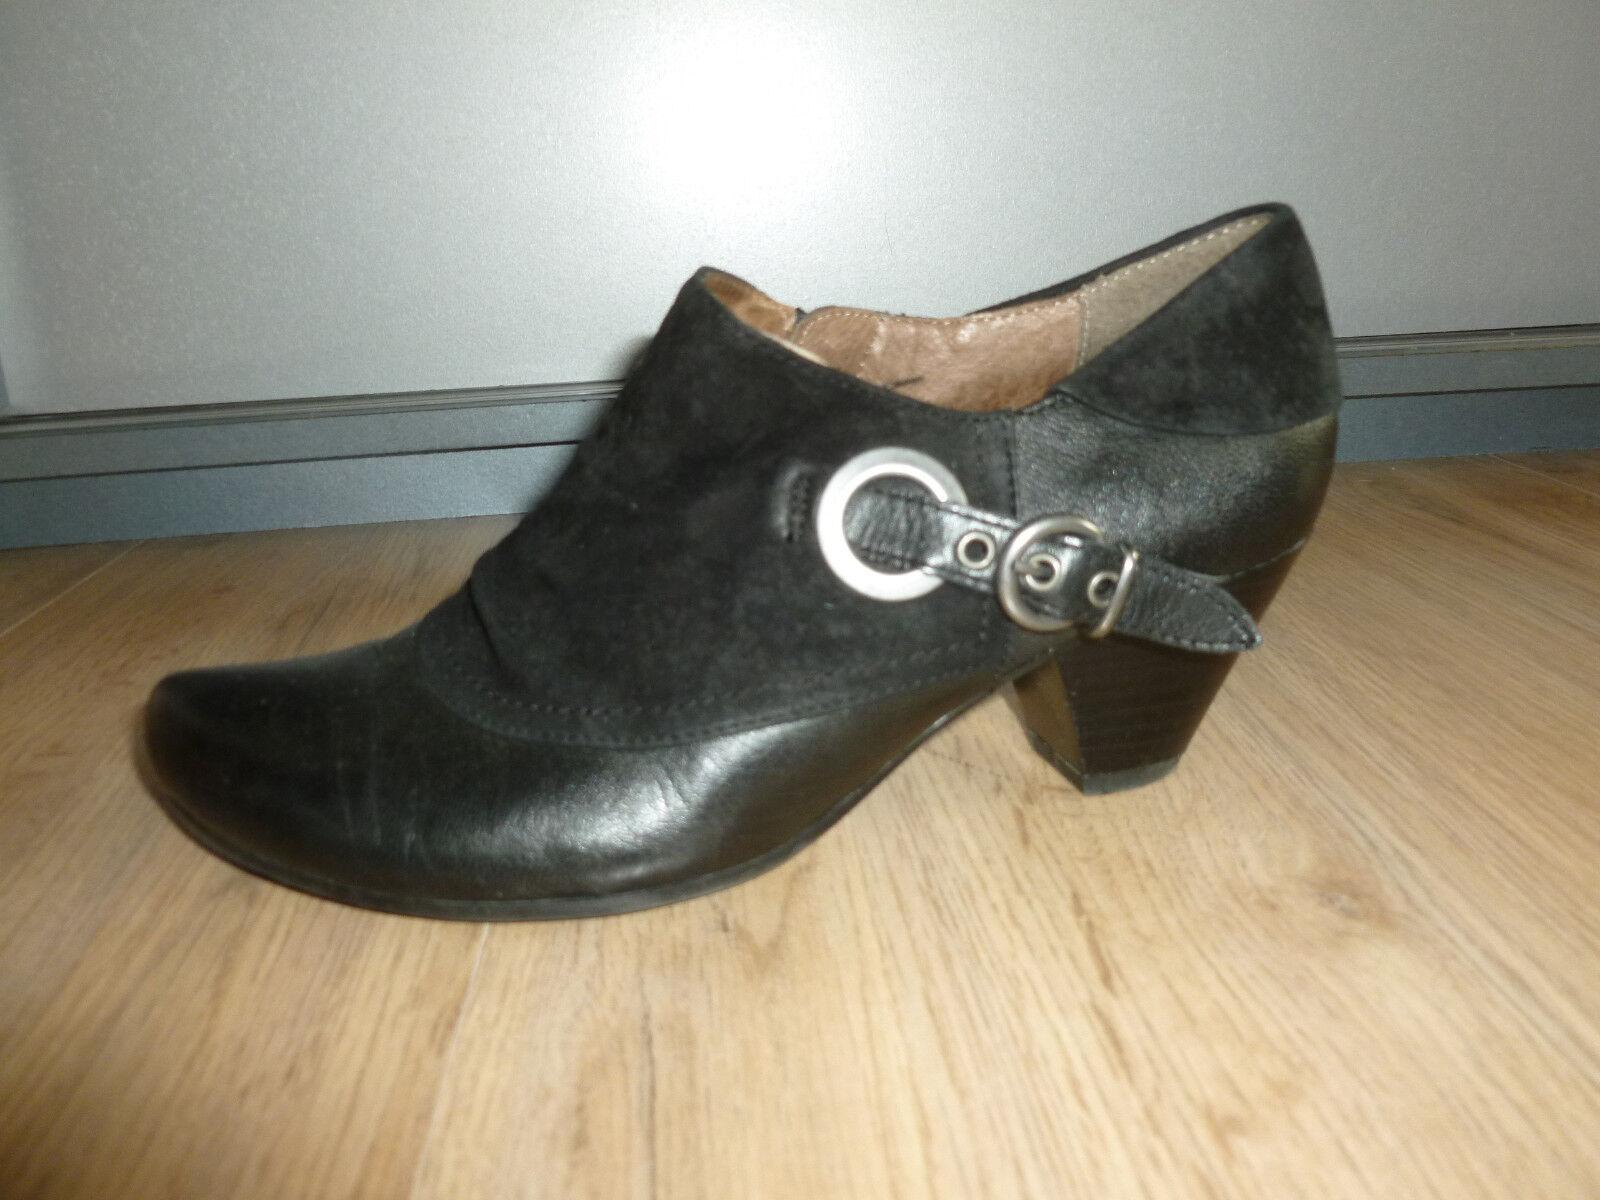 Paumps Schuhe schwarz Leder Caprice Caprice Leder 37,5 4,5 b44745